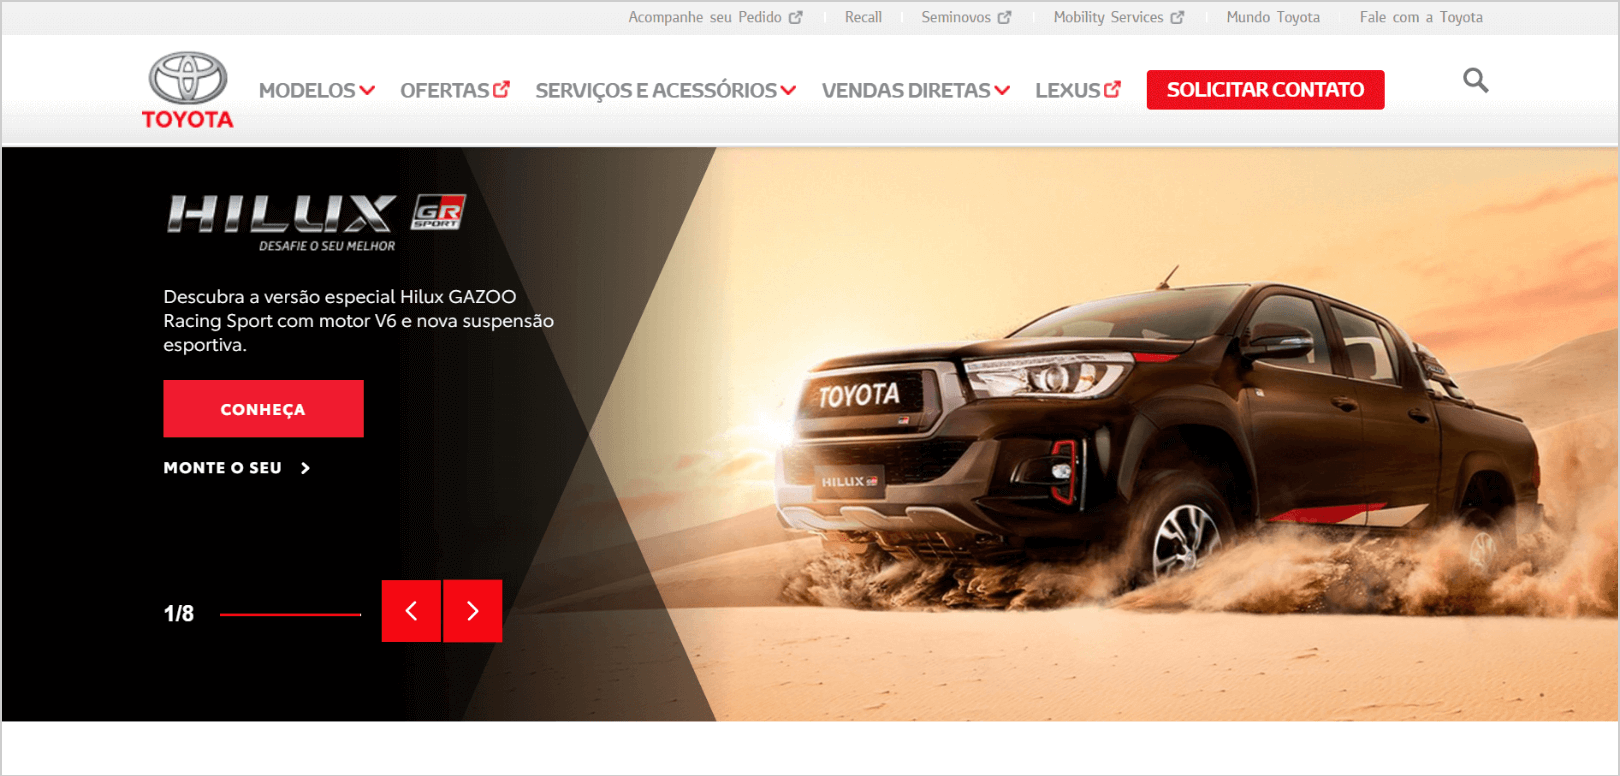 Toyota Brazil desktop WordPress website layout